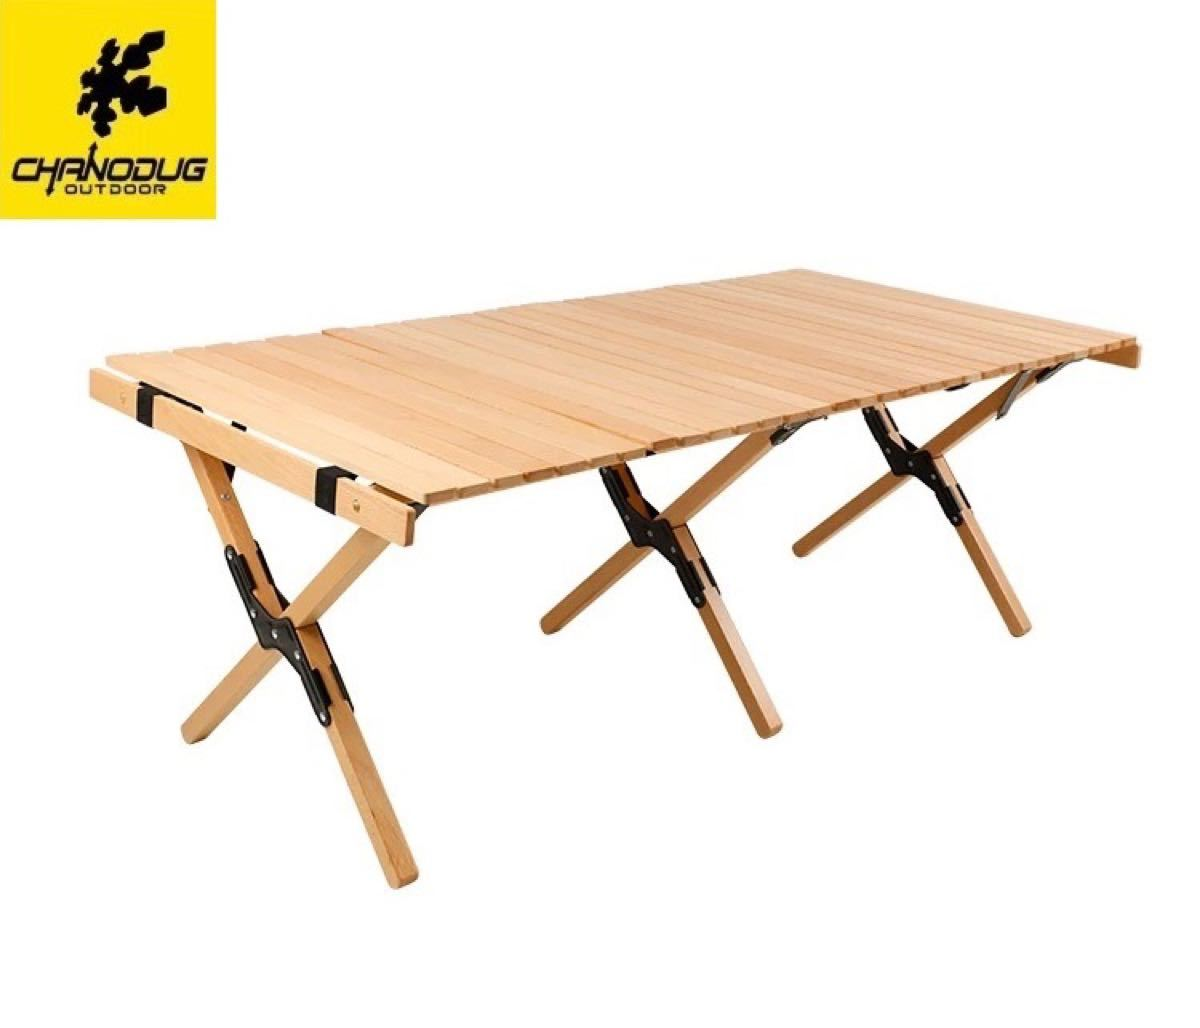 CHANODUGウッドロールテーブル Lサイズ 収納ケース付 アウトドアテーブル